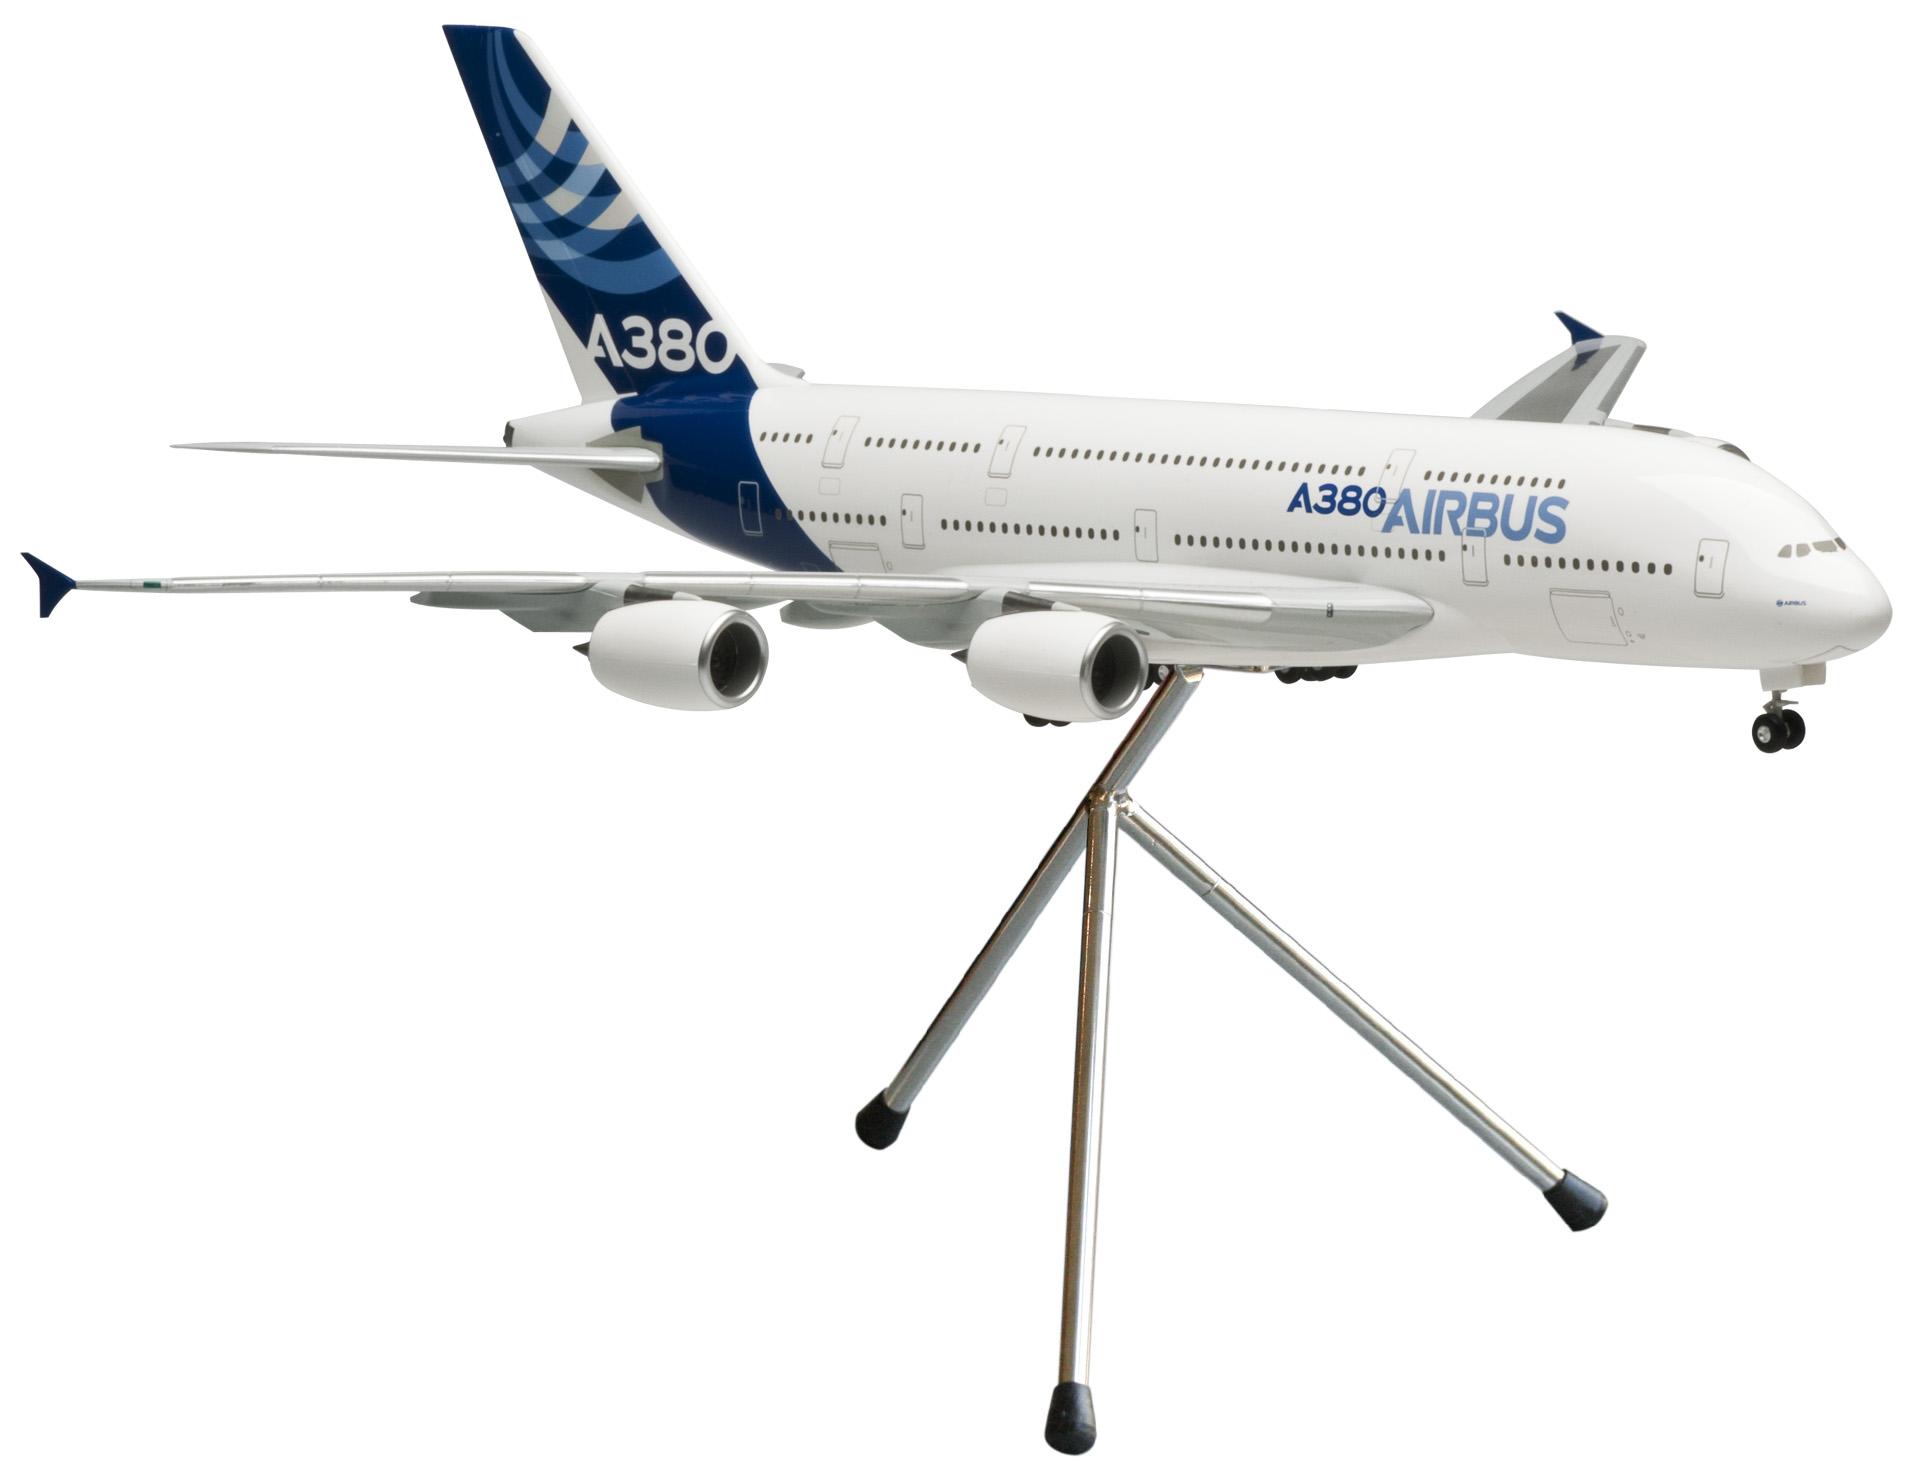 Scale model airbus 1 200 a380hc airbus for Modellino concorde